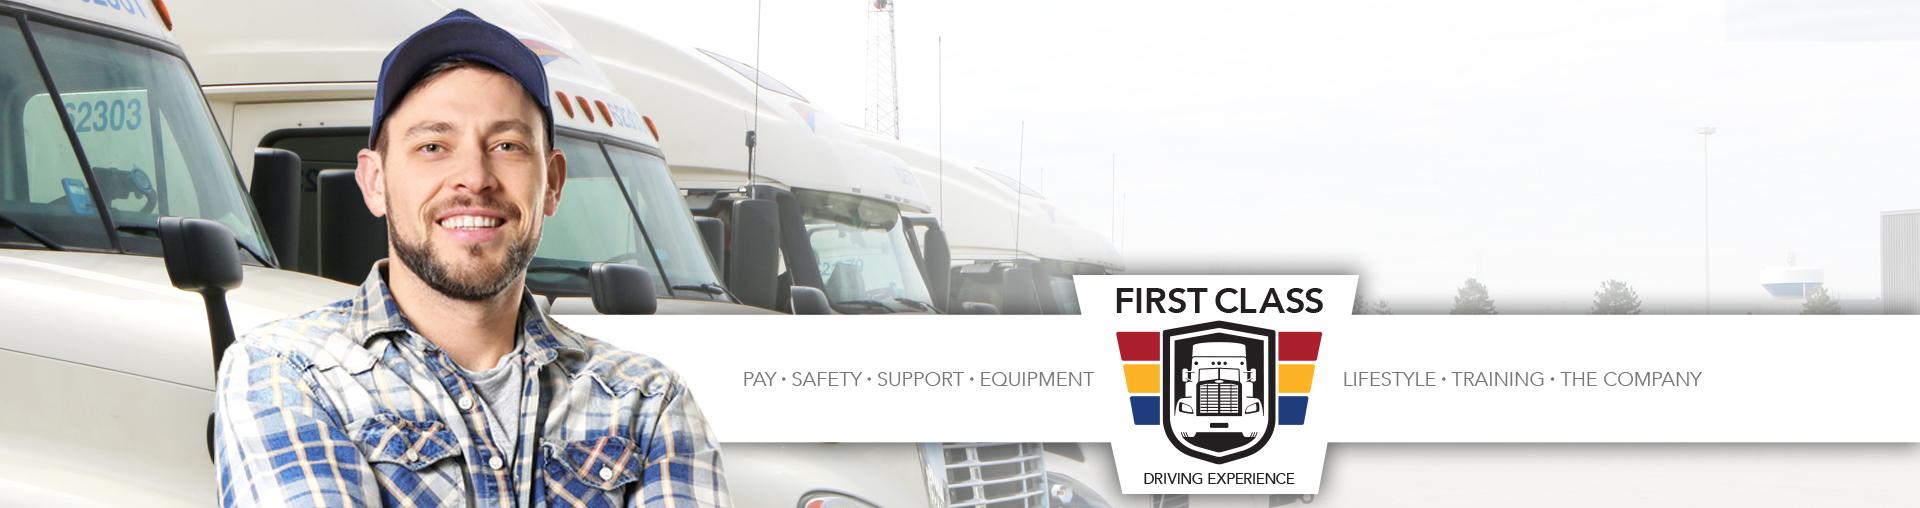 Challenger: Transportation, Warehousing and Logistics